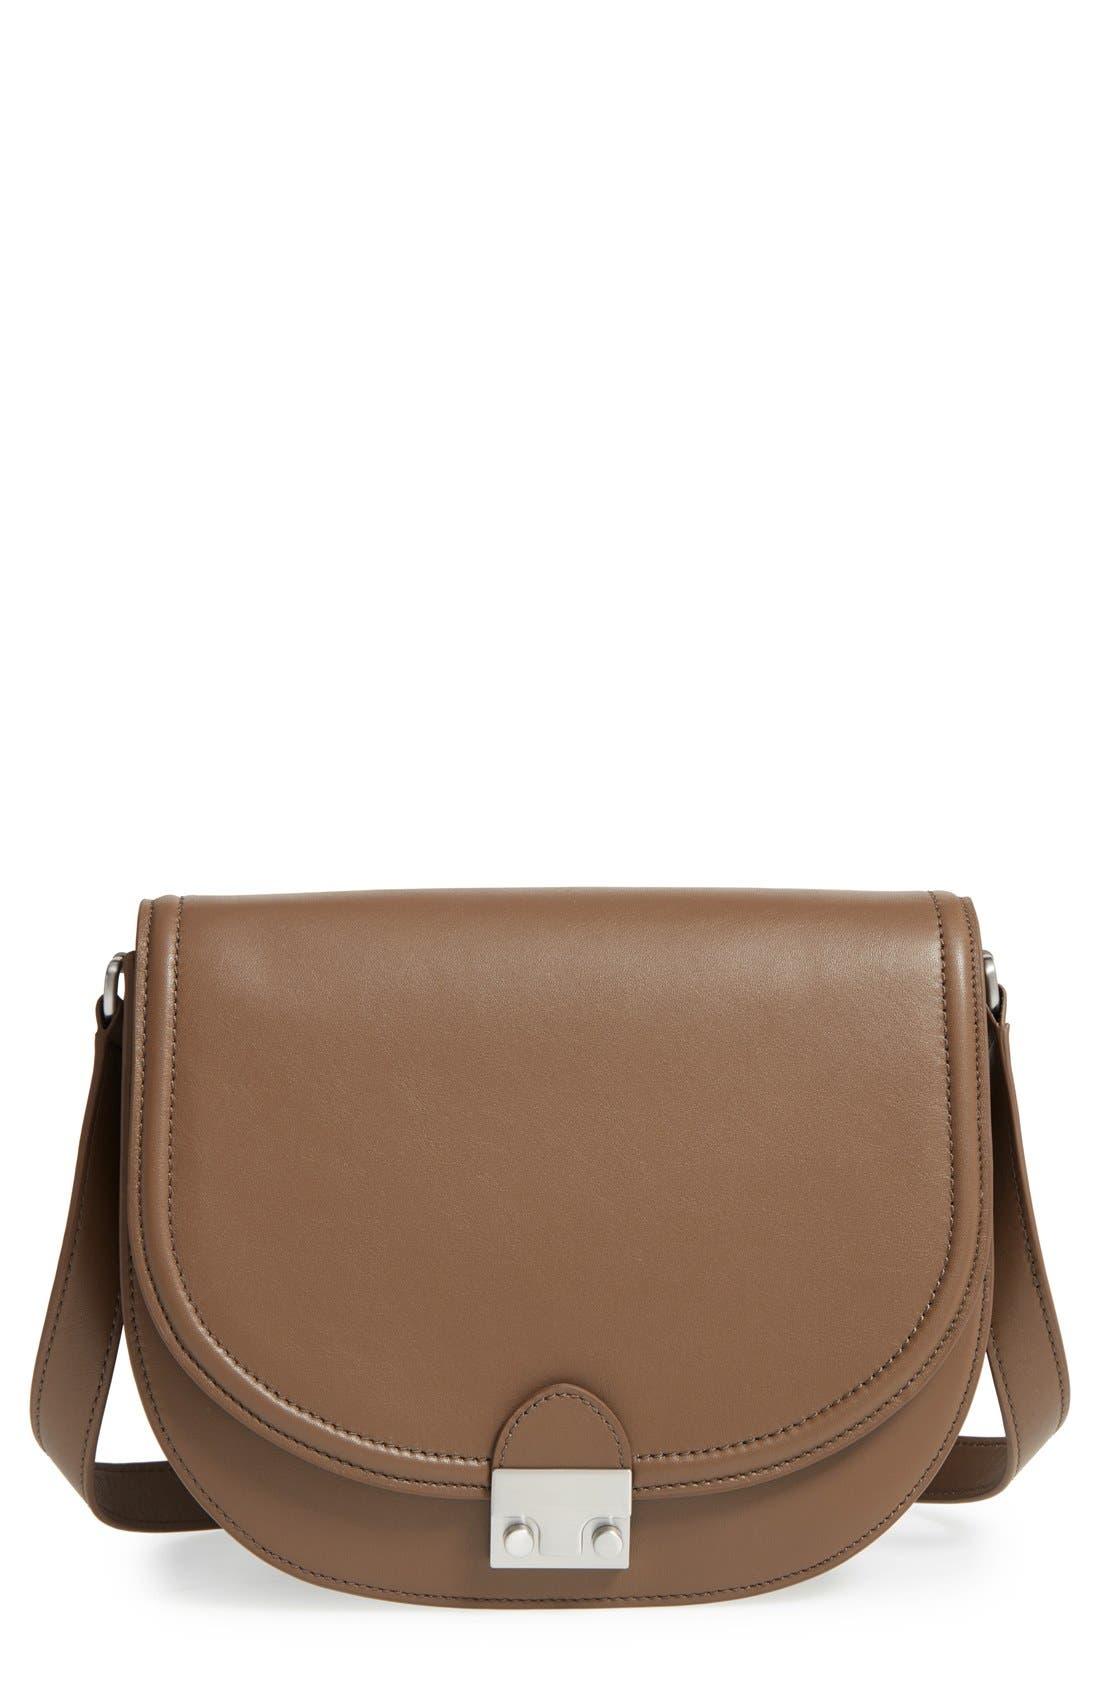 'Large' Leather Saddle Bag,                             Main thumbnail 1, color,                             300